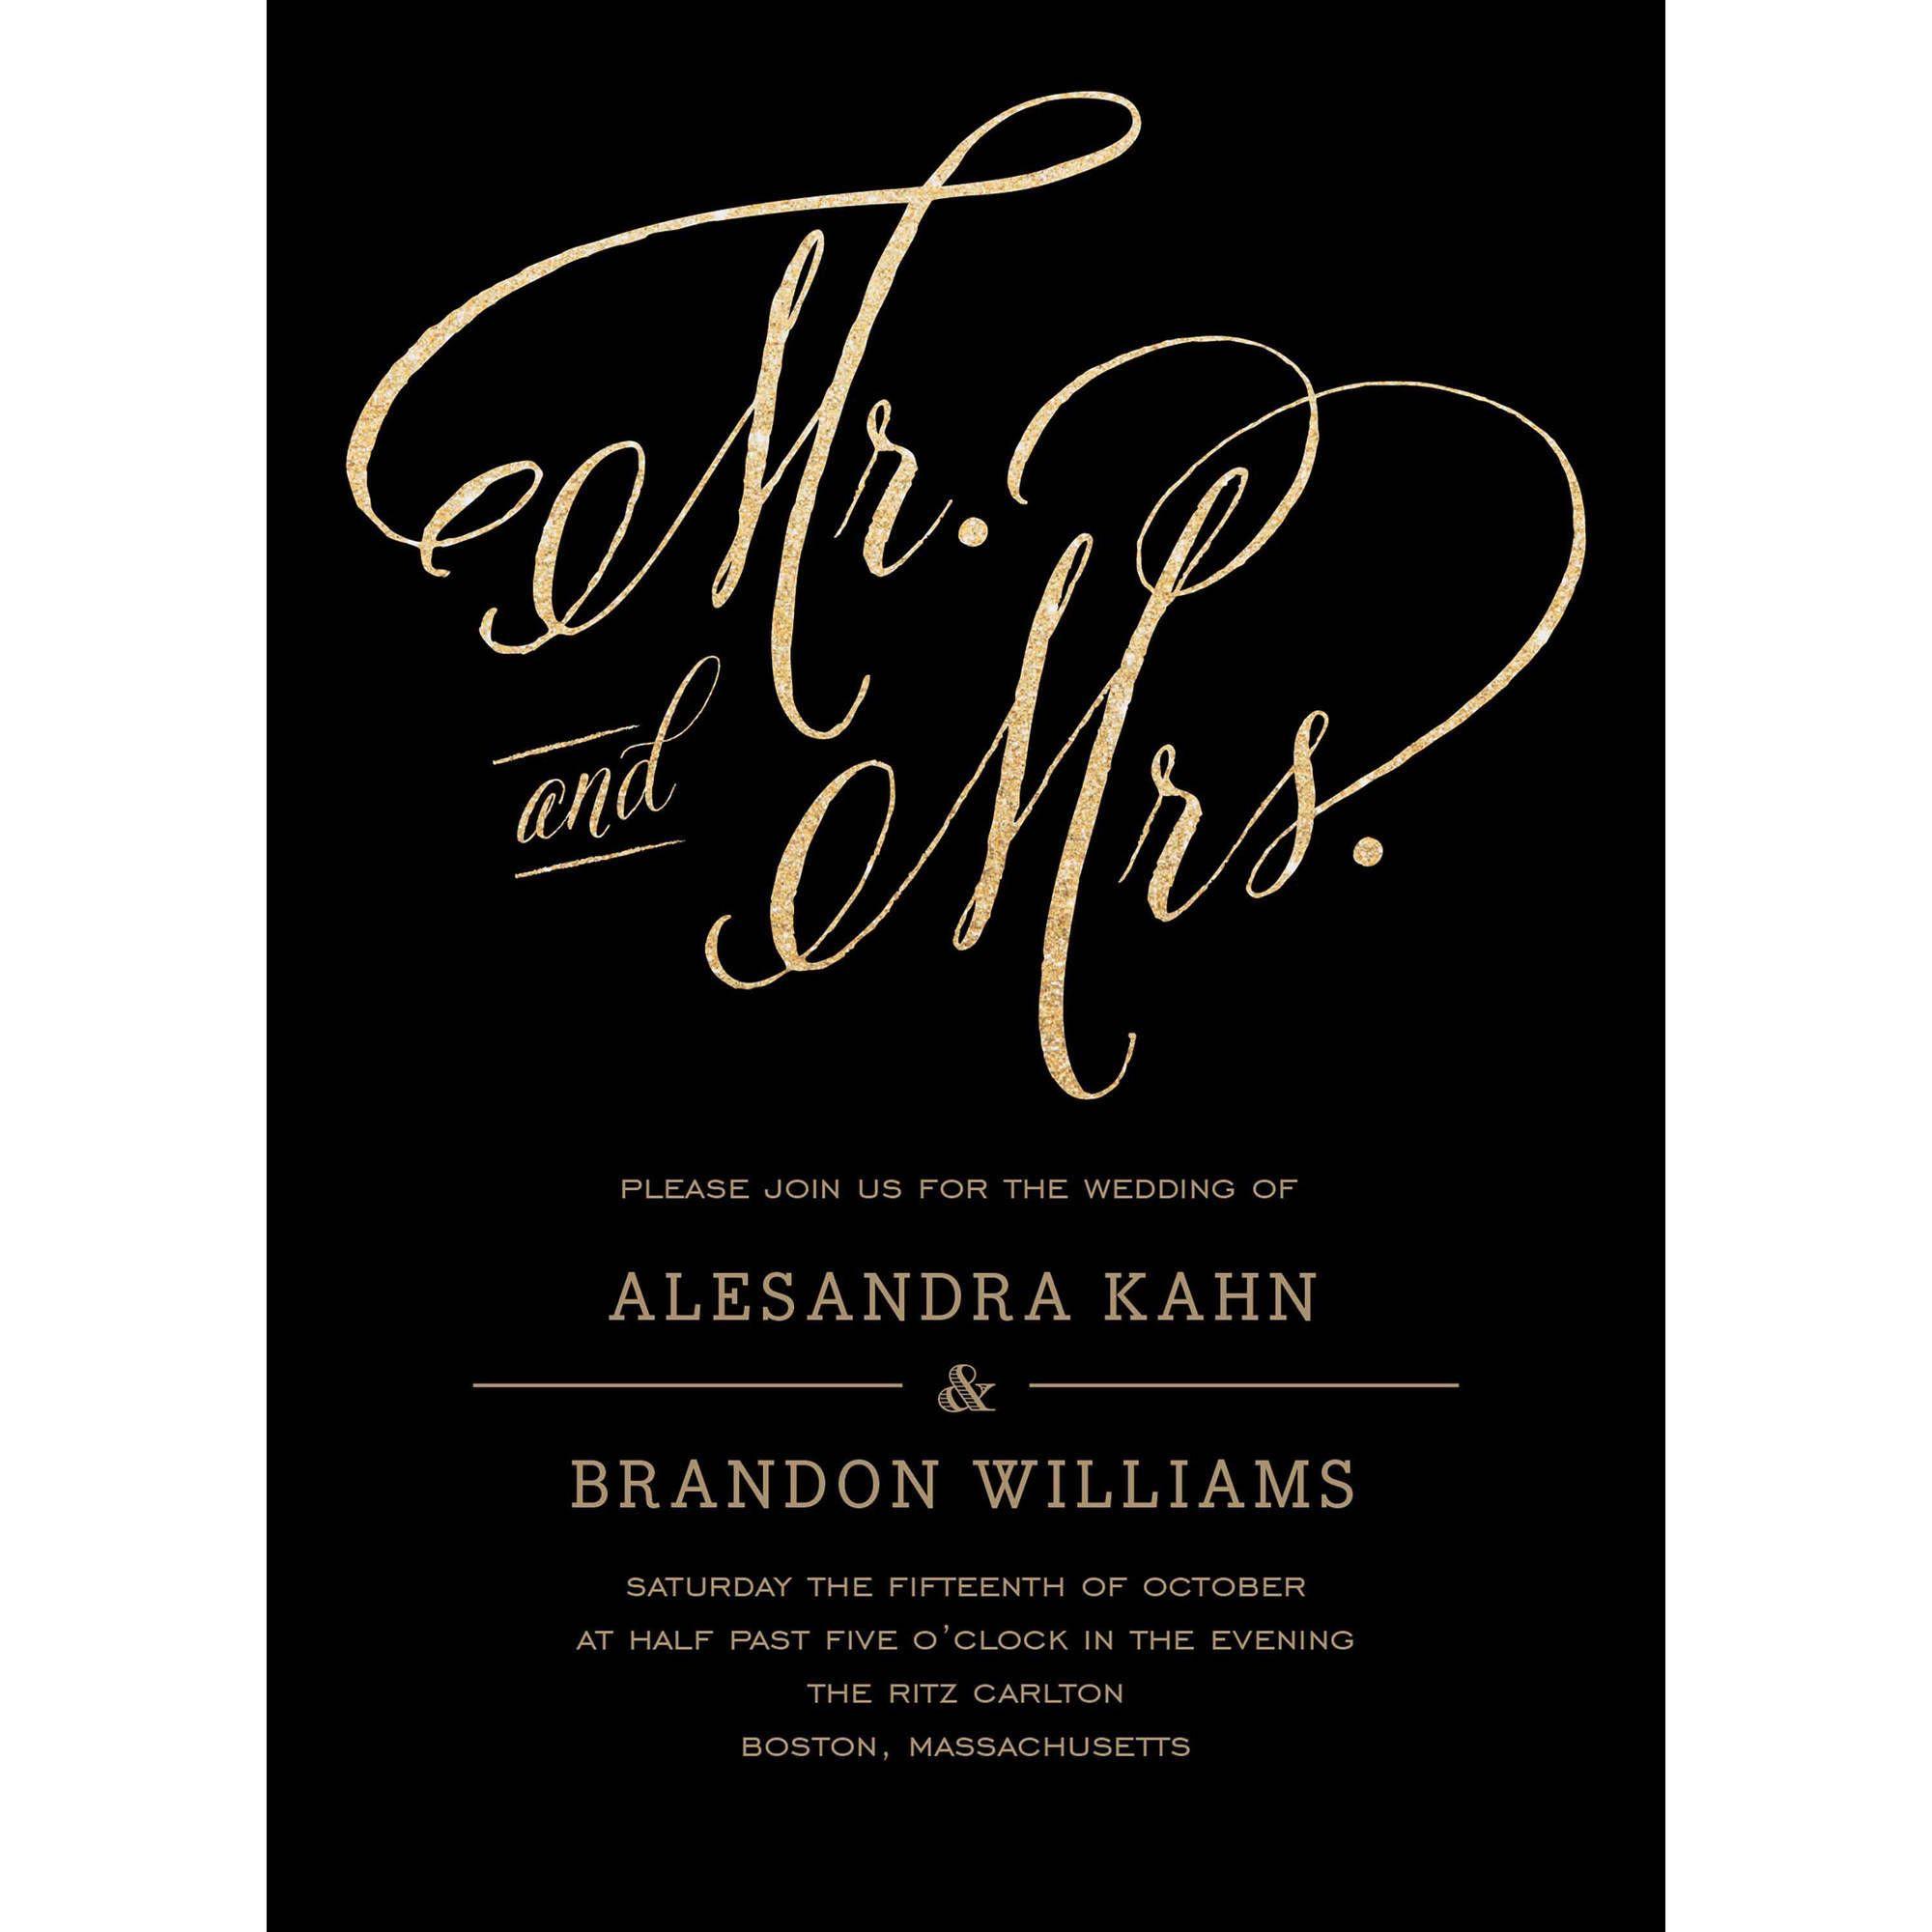 Mr And Mrs Standard Wedding Invitation Walmart Com In 2021 Cheap Wedding Invitations Wedding Invitations Bridal Shower Invitations